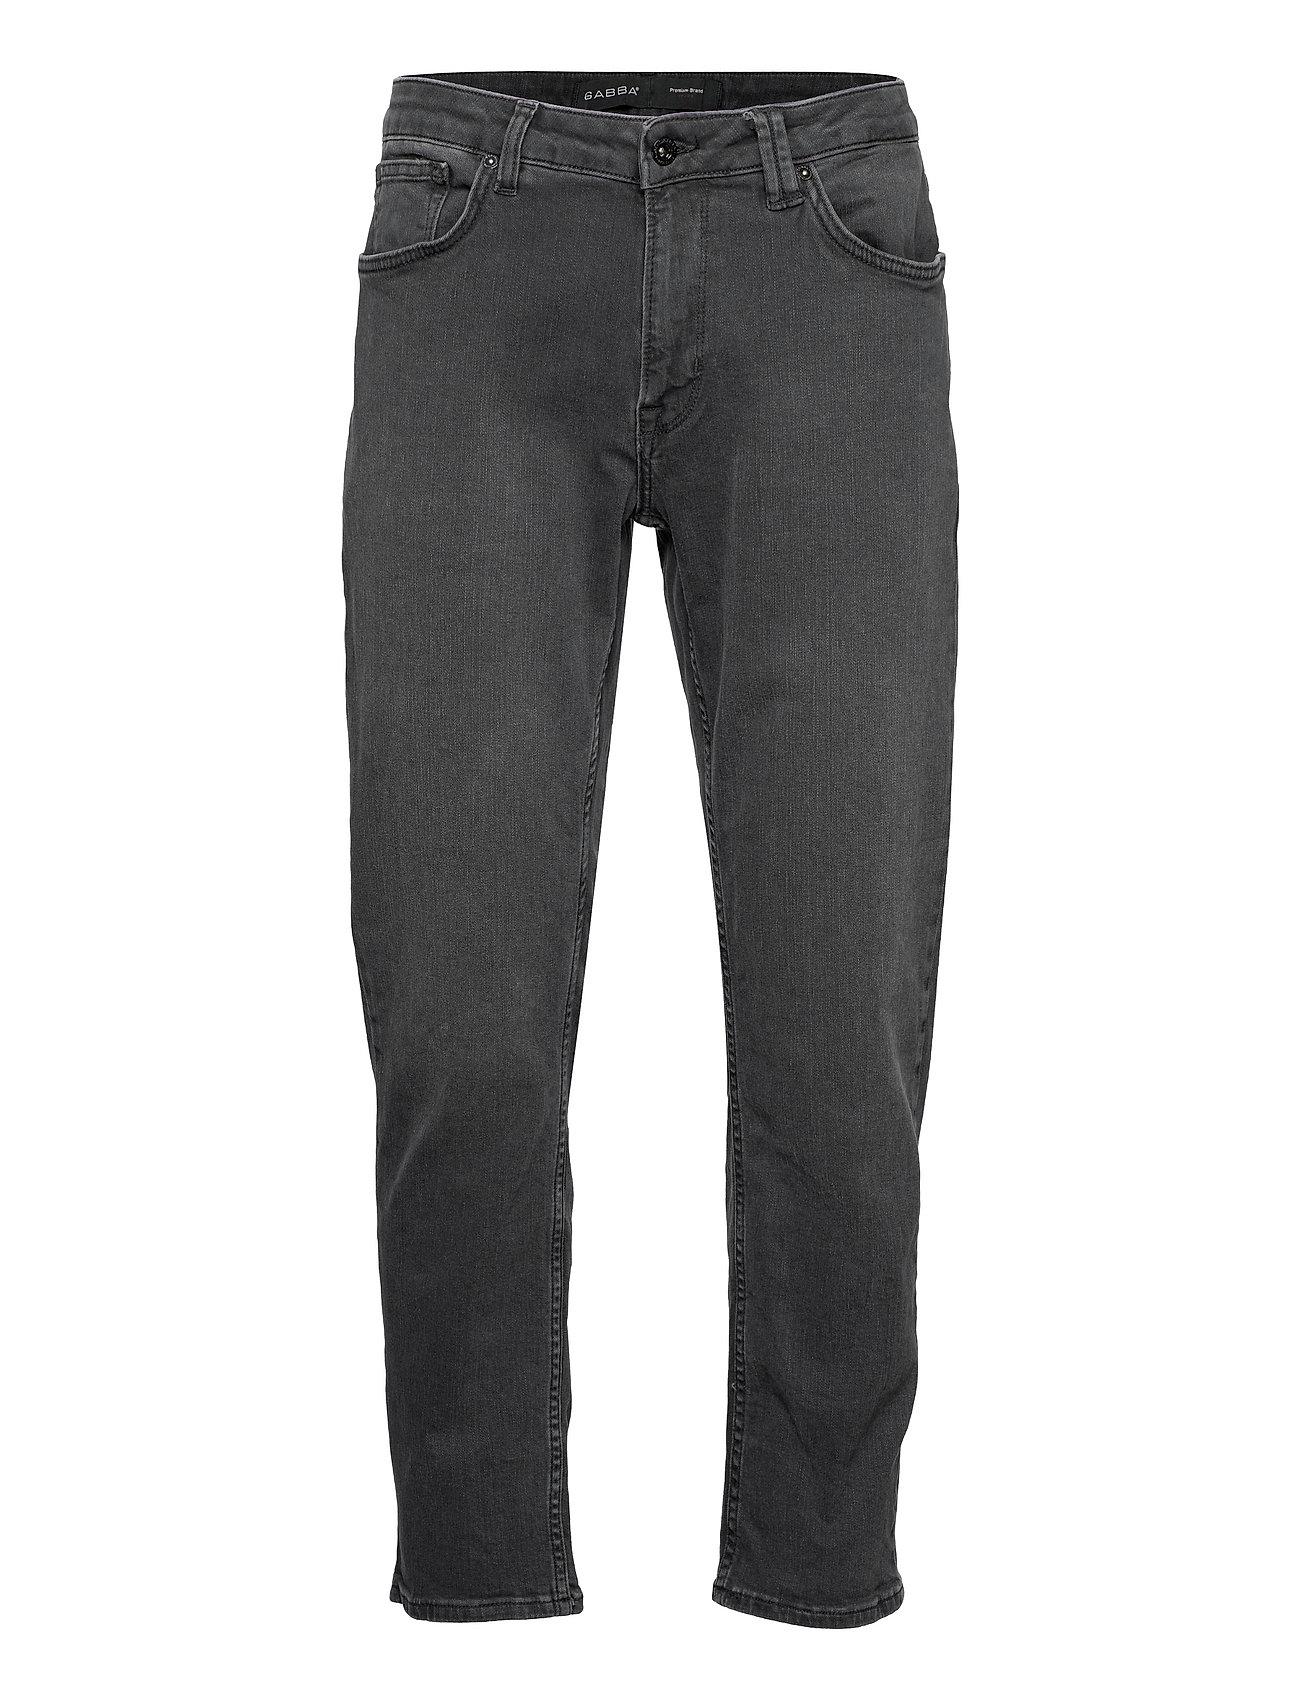 Image of Math K4196 Jeans Jeans Loose Grå Gabba (3559628365)